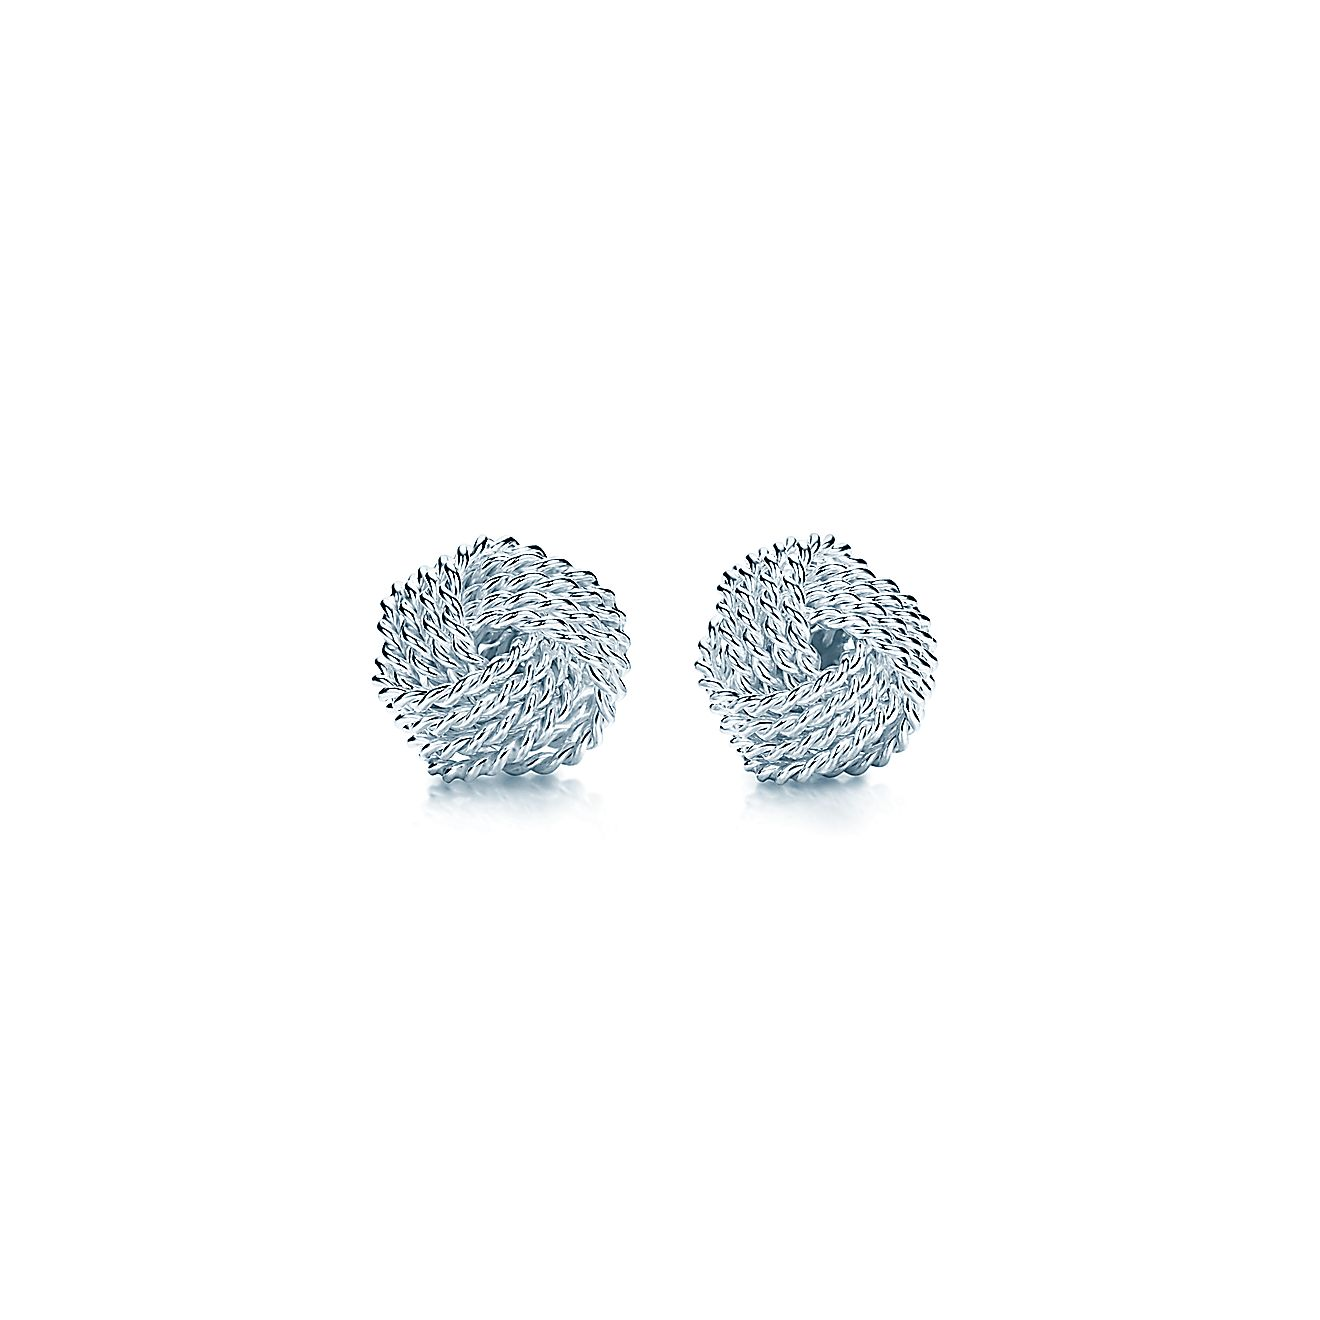 Tiffany knot earrings white gold